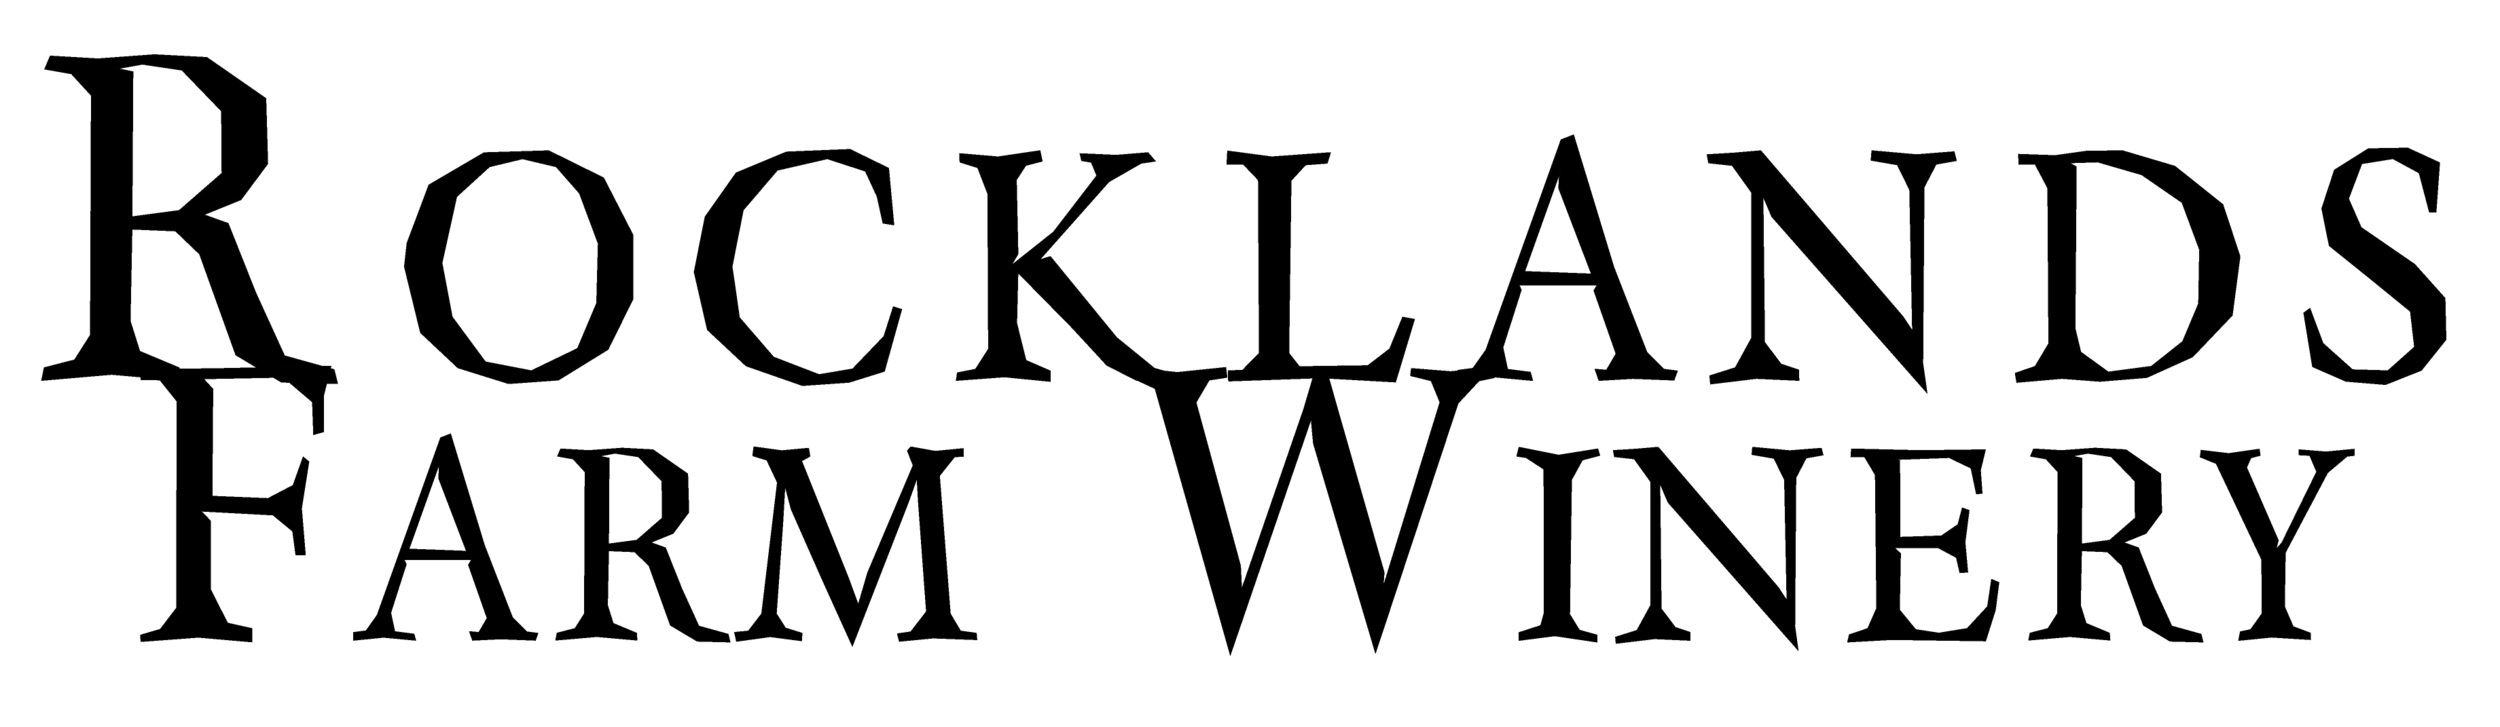 rocklands-logo-trial.png